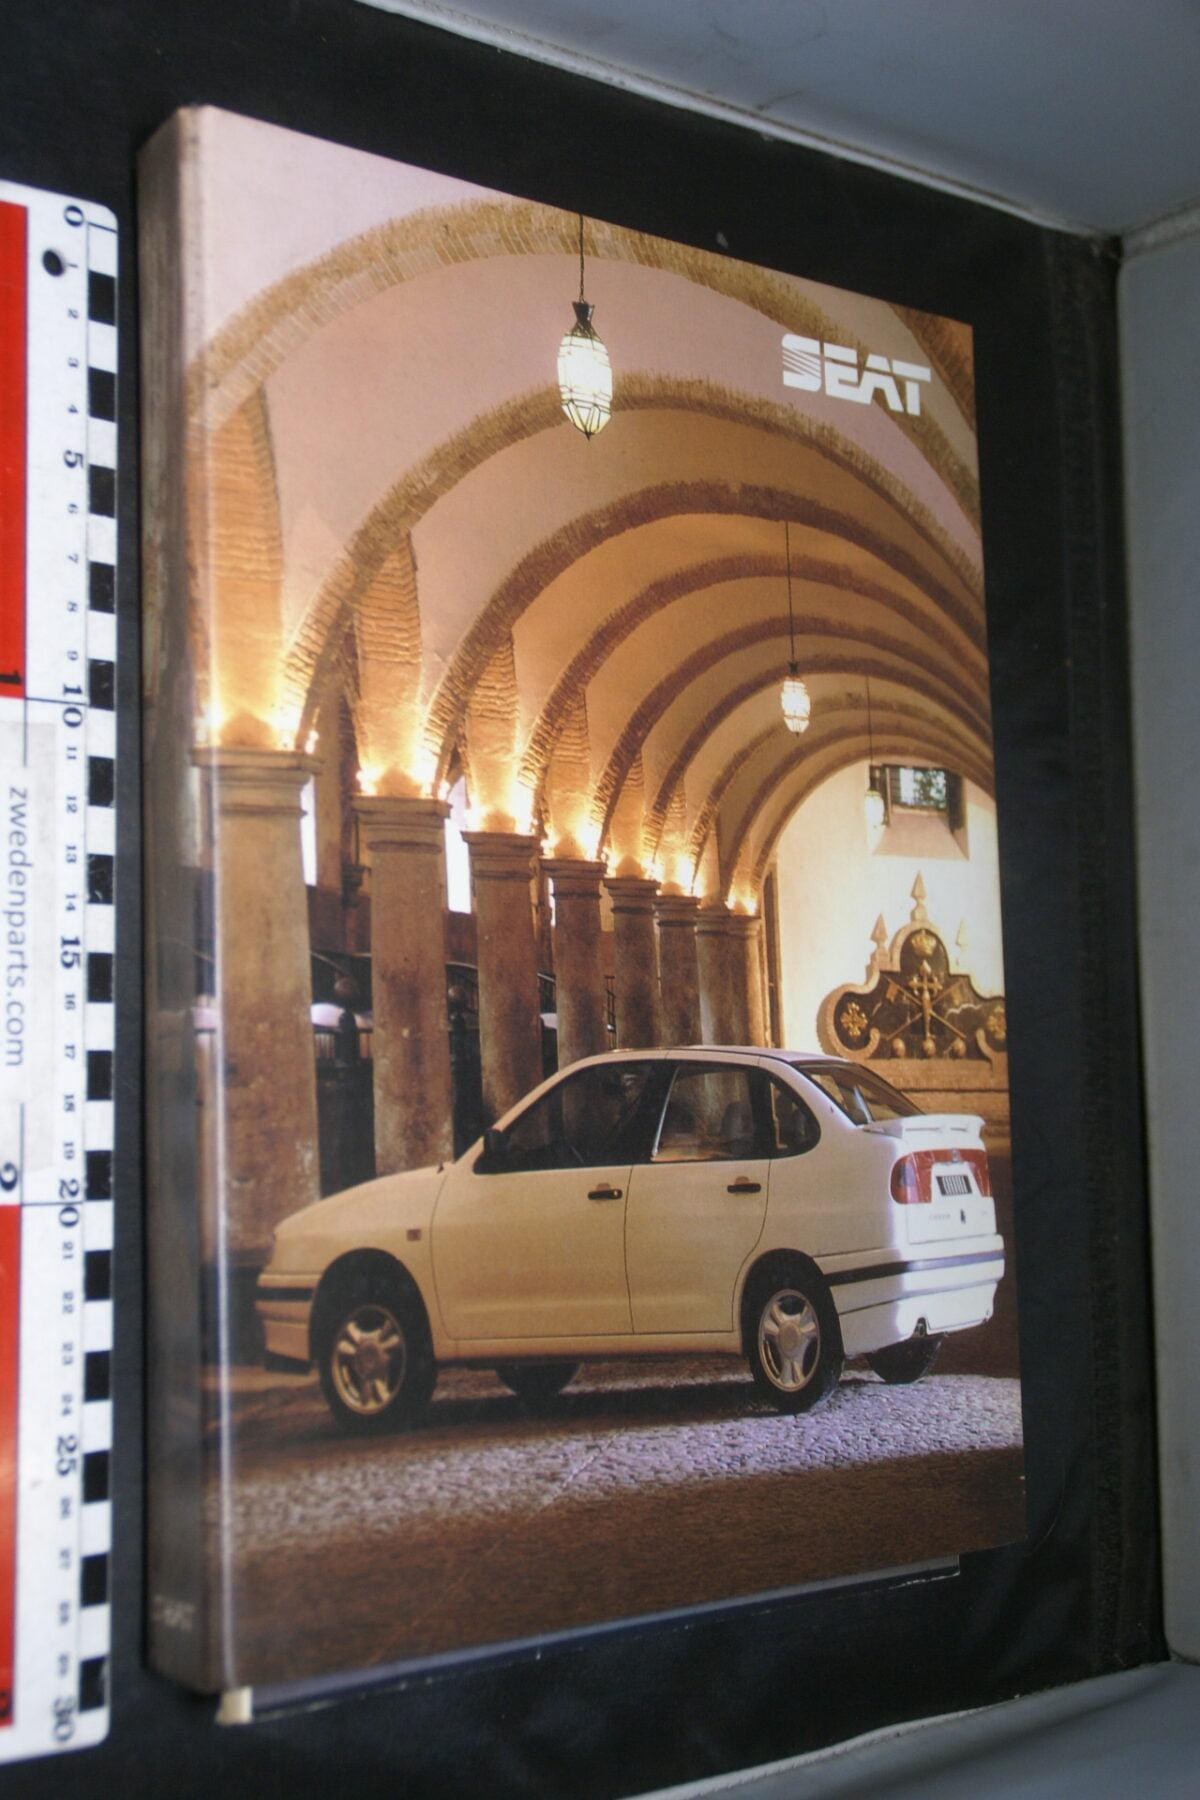 DSC03747 1998 originele persmap dikke ringband SEAT, English-45fec65c